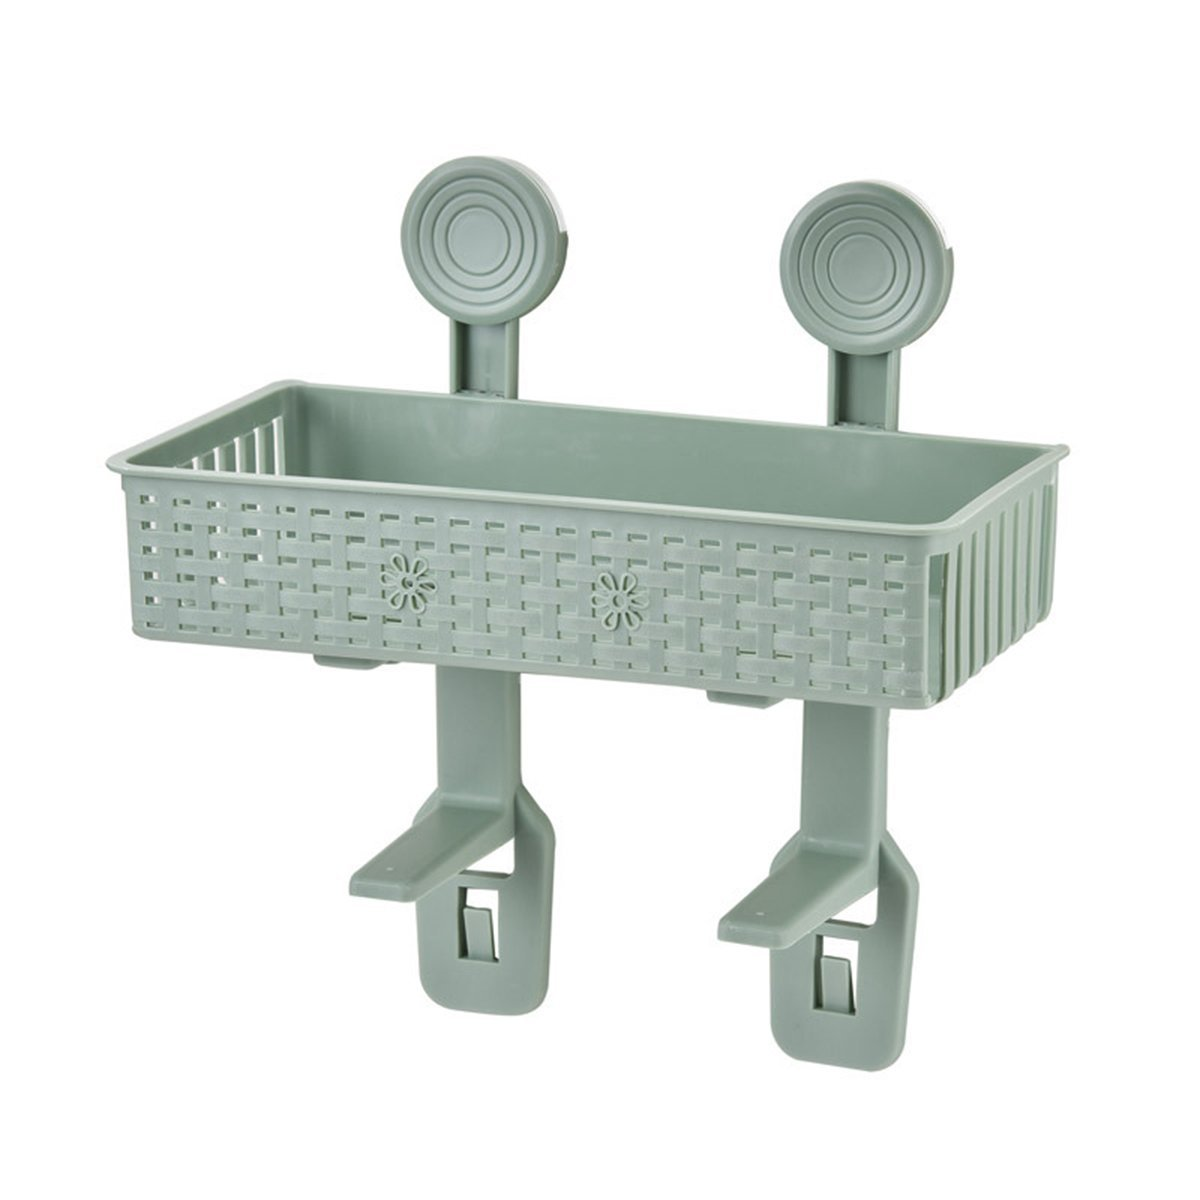 OUNONA Bathroom Basket Suction Cup Organizer Holder Wall Mounted Kitchen Toilet Shelf Storage Rack for Toilet Paper Shower Gel Shampoo (Green)